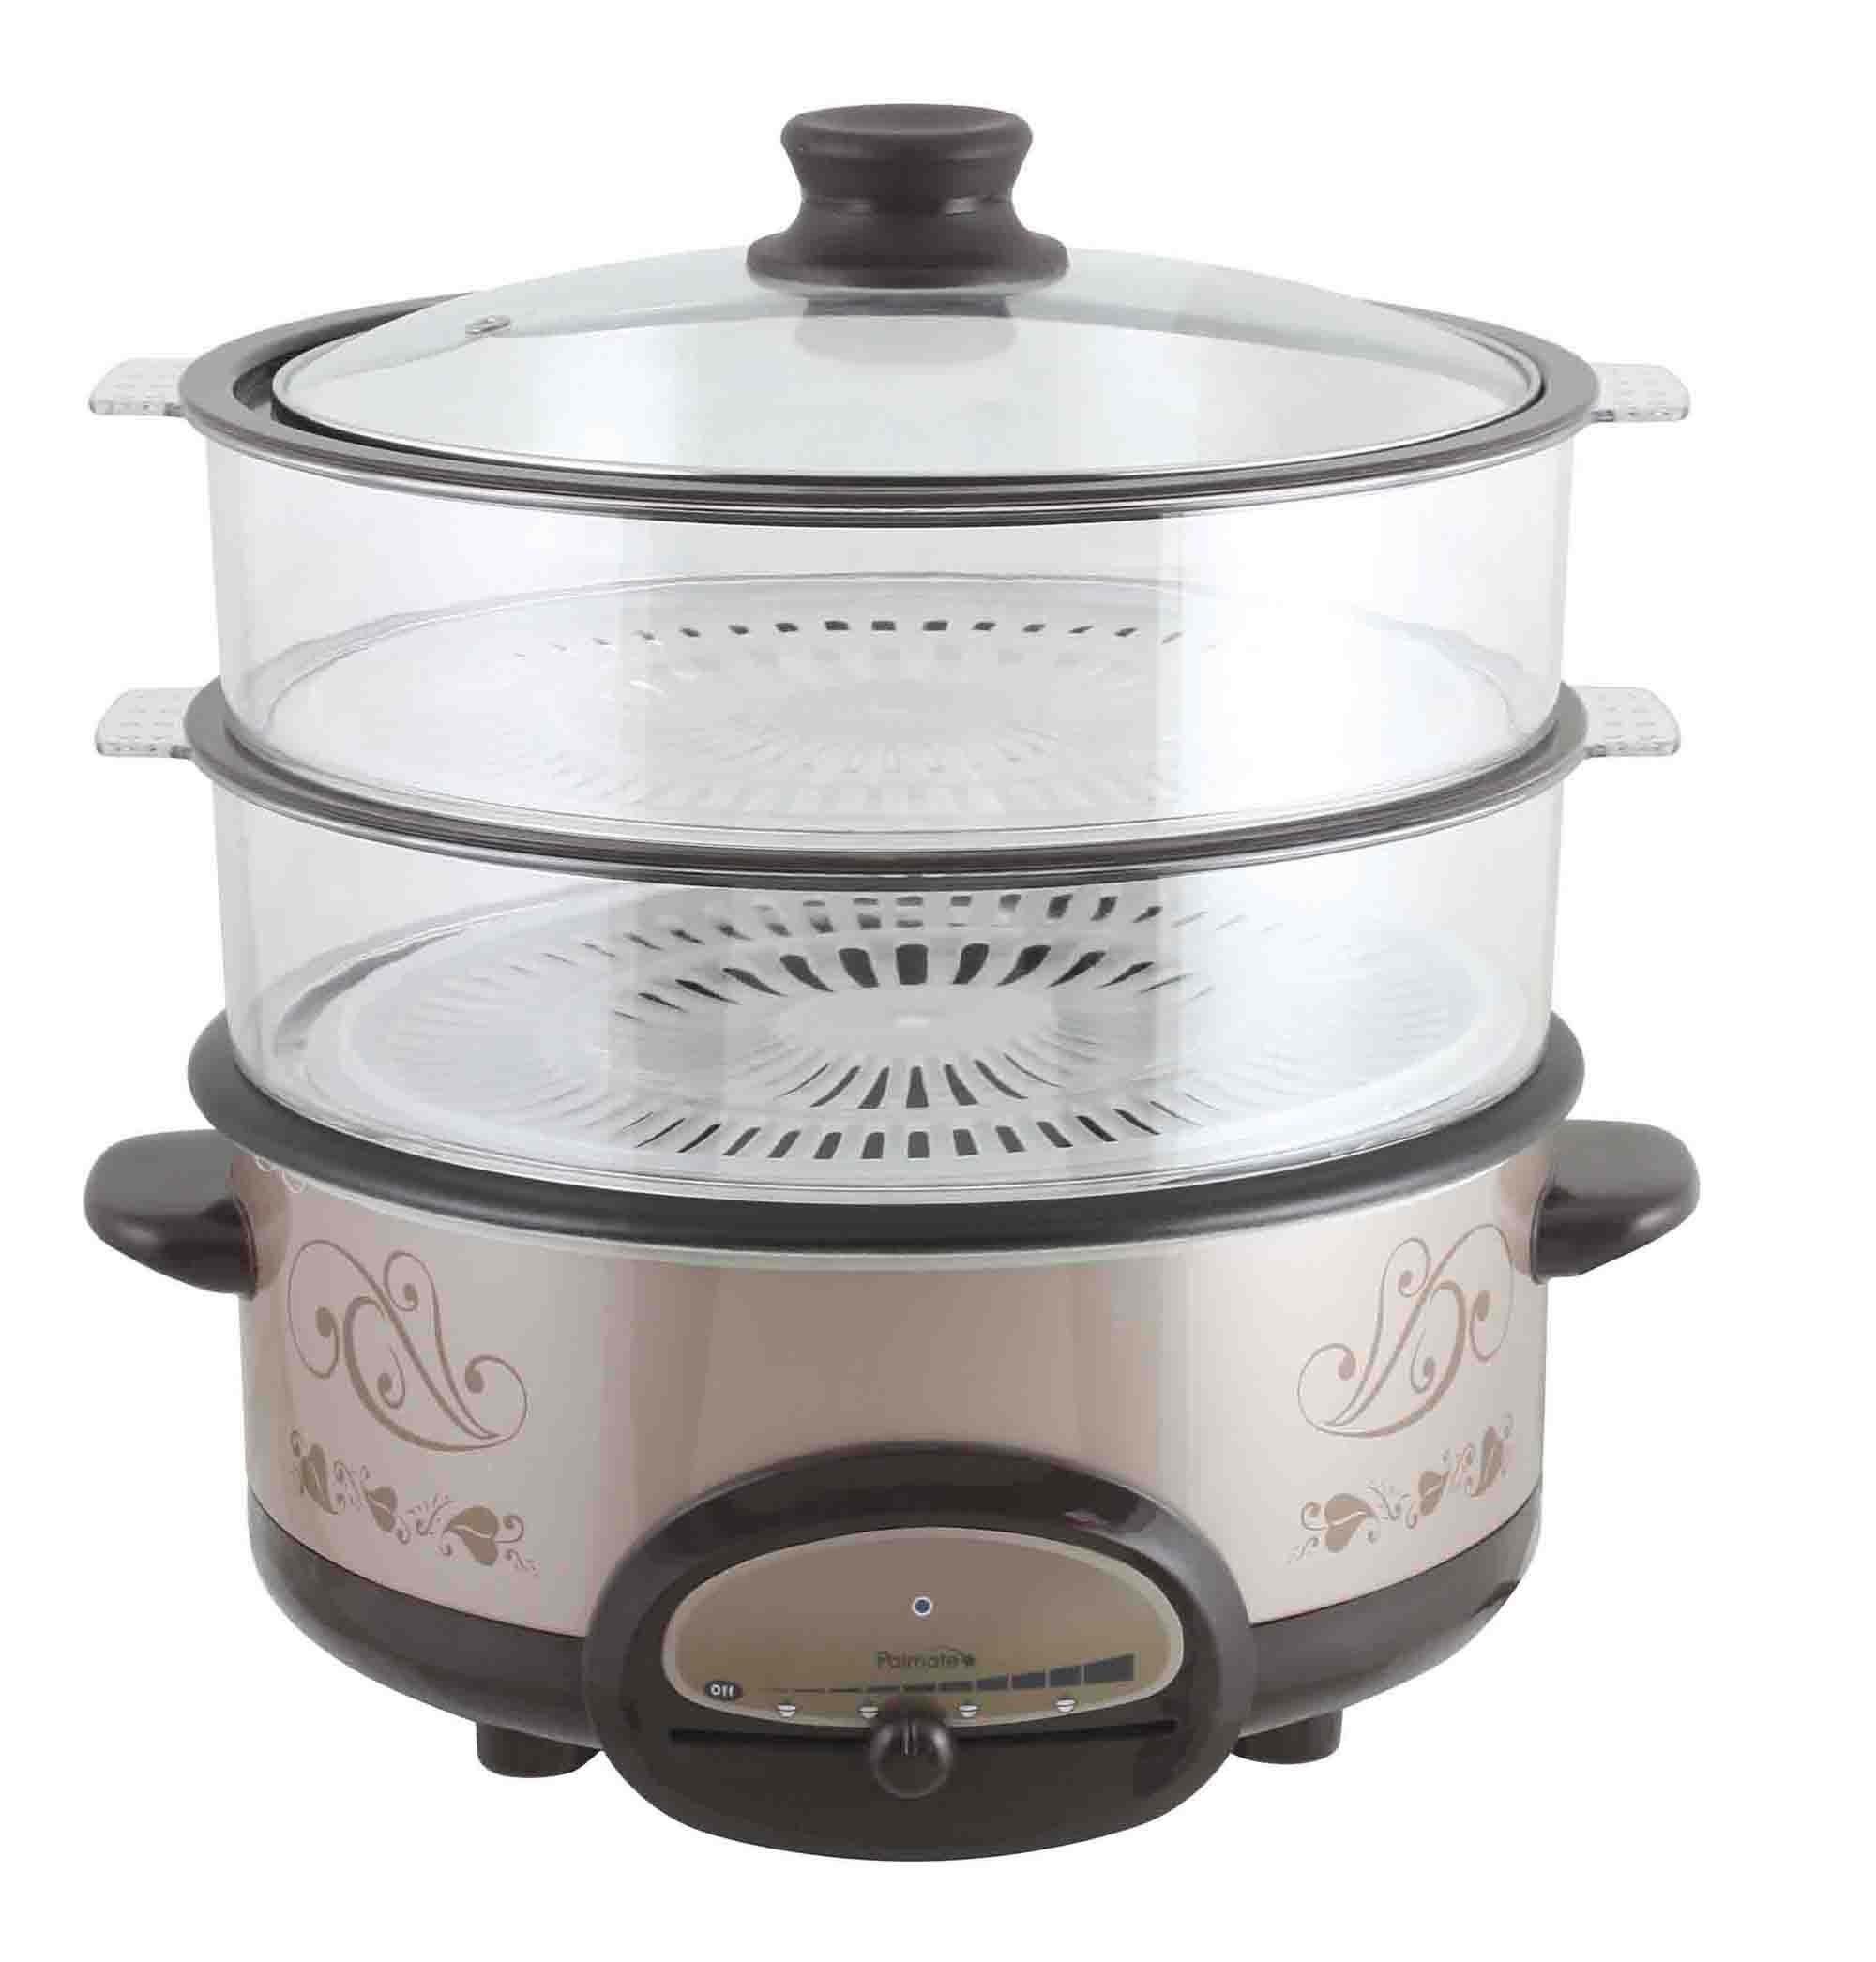 China multi cooker xkl130 e china multi cooker cooker for Multi cooker